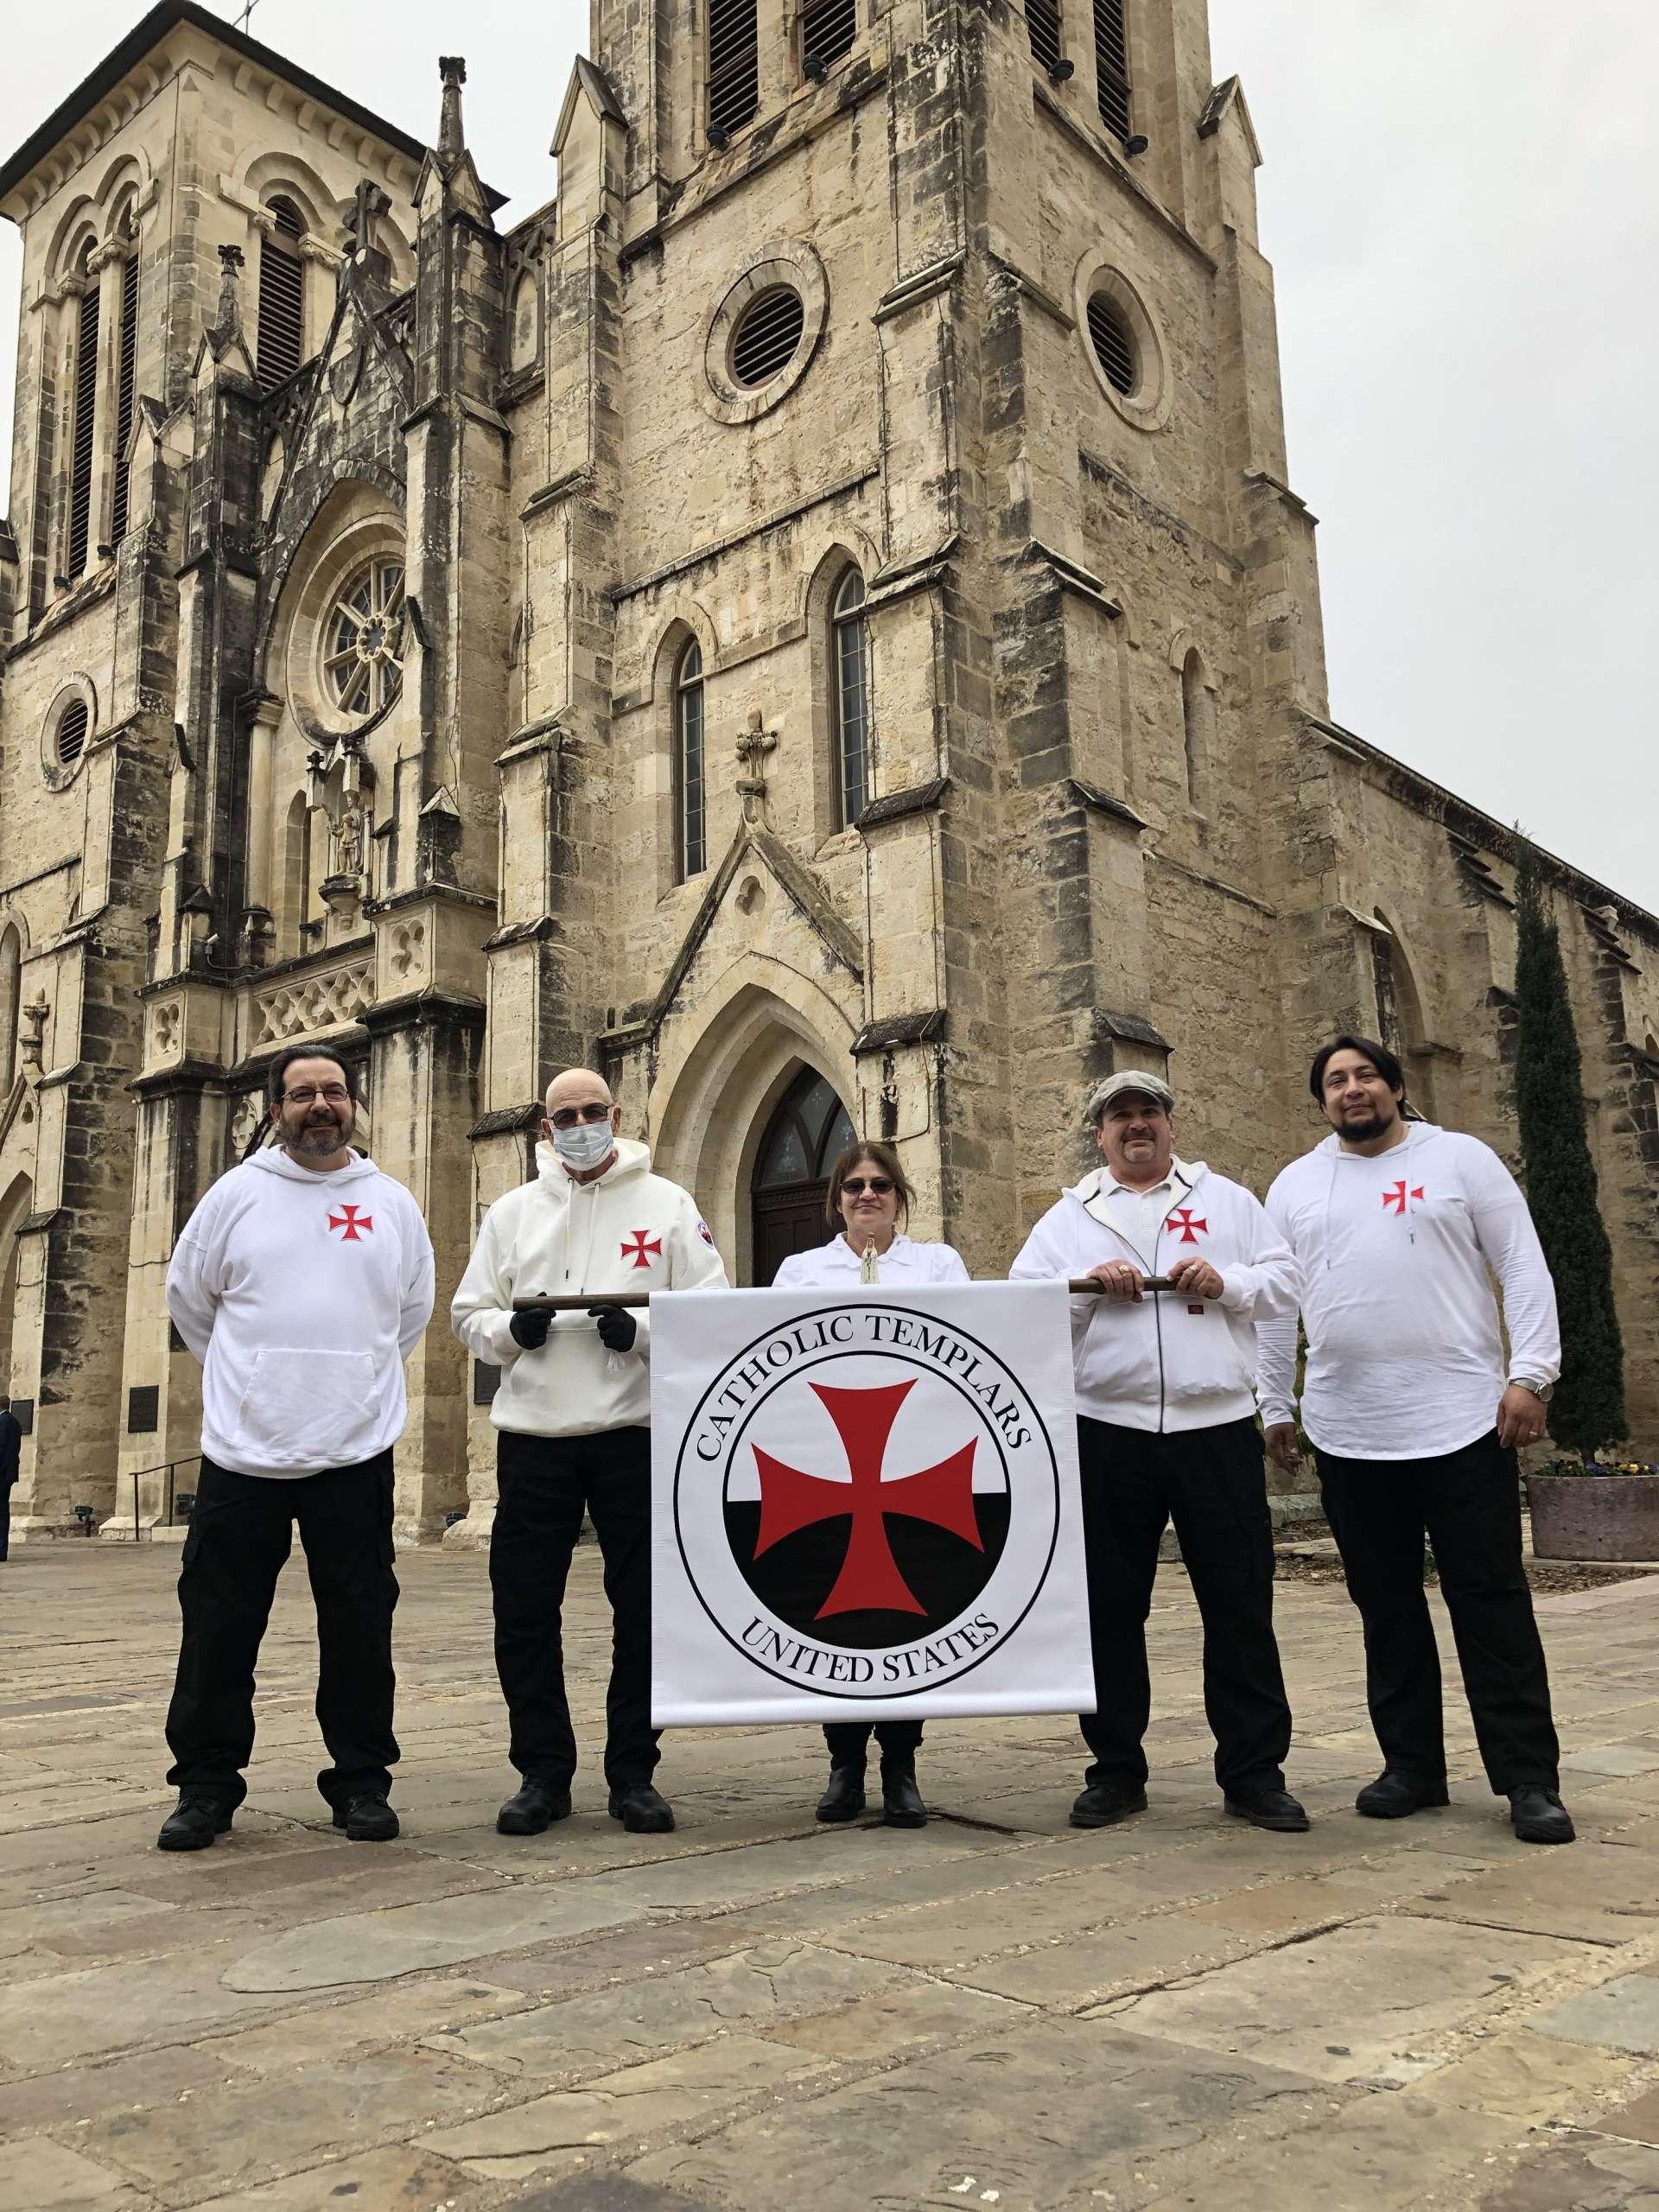 March for Life 2021 San Antonio, Texas USA